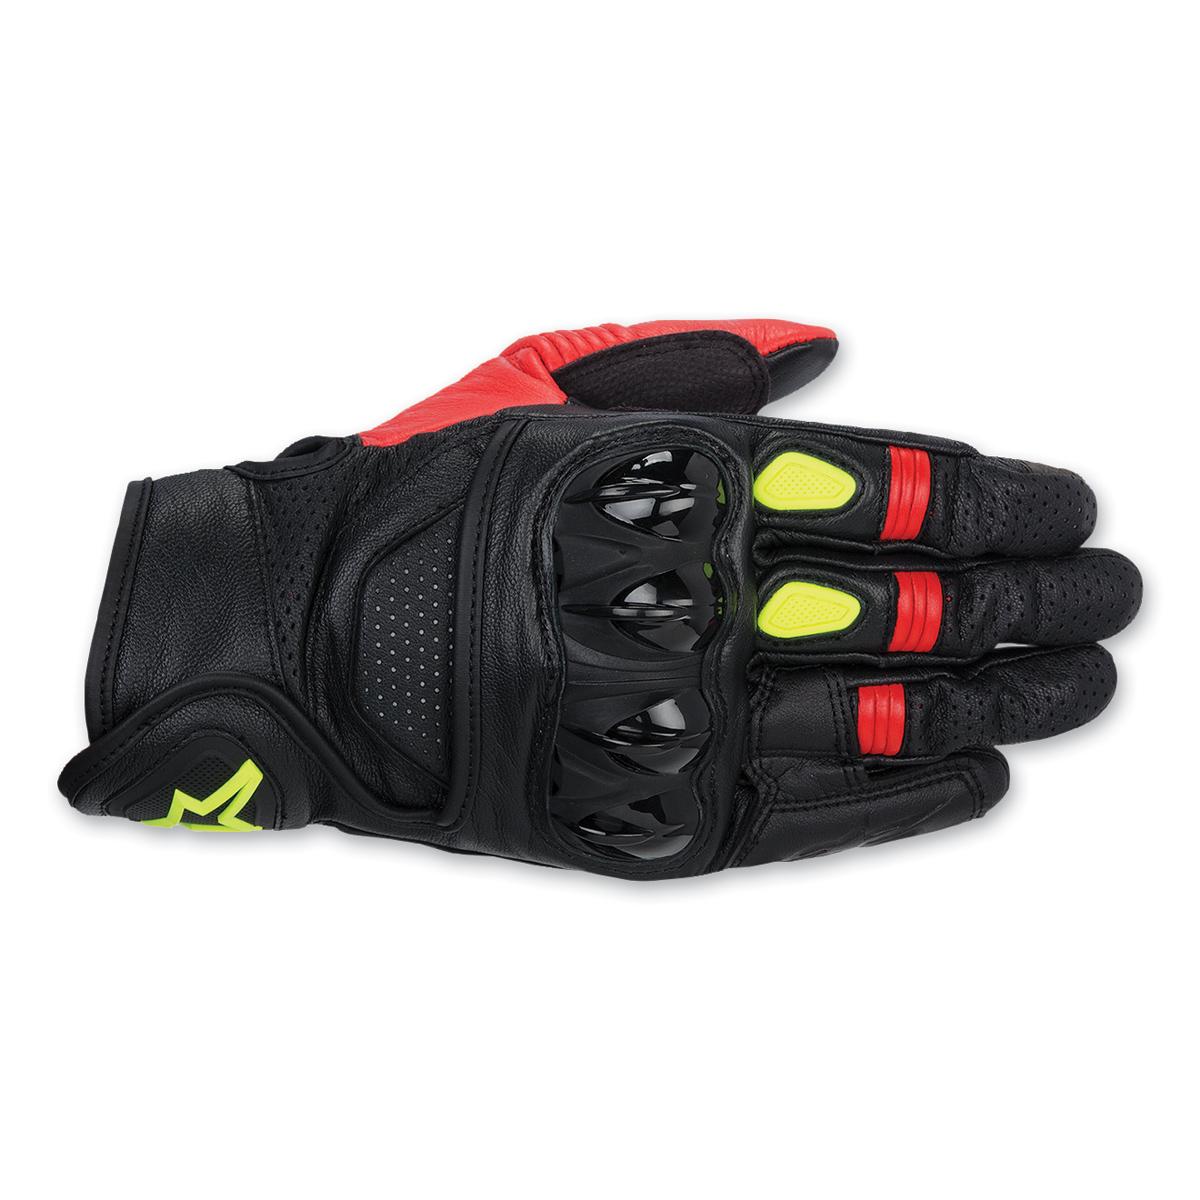 Alpinestars Men's Celer Black/Red/Hi-Viz Leather Gloves